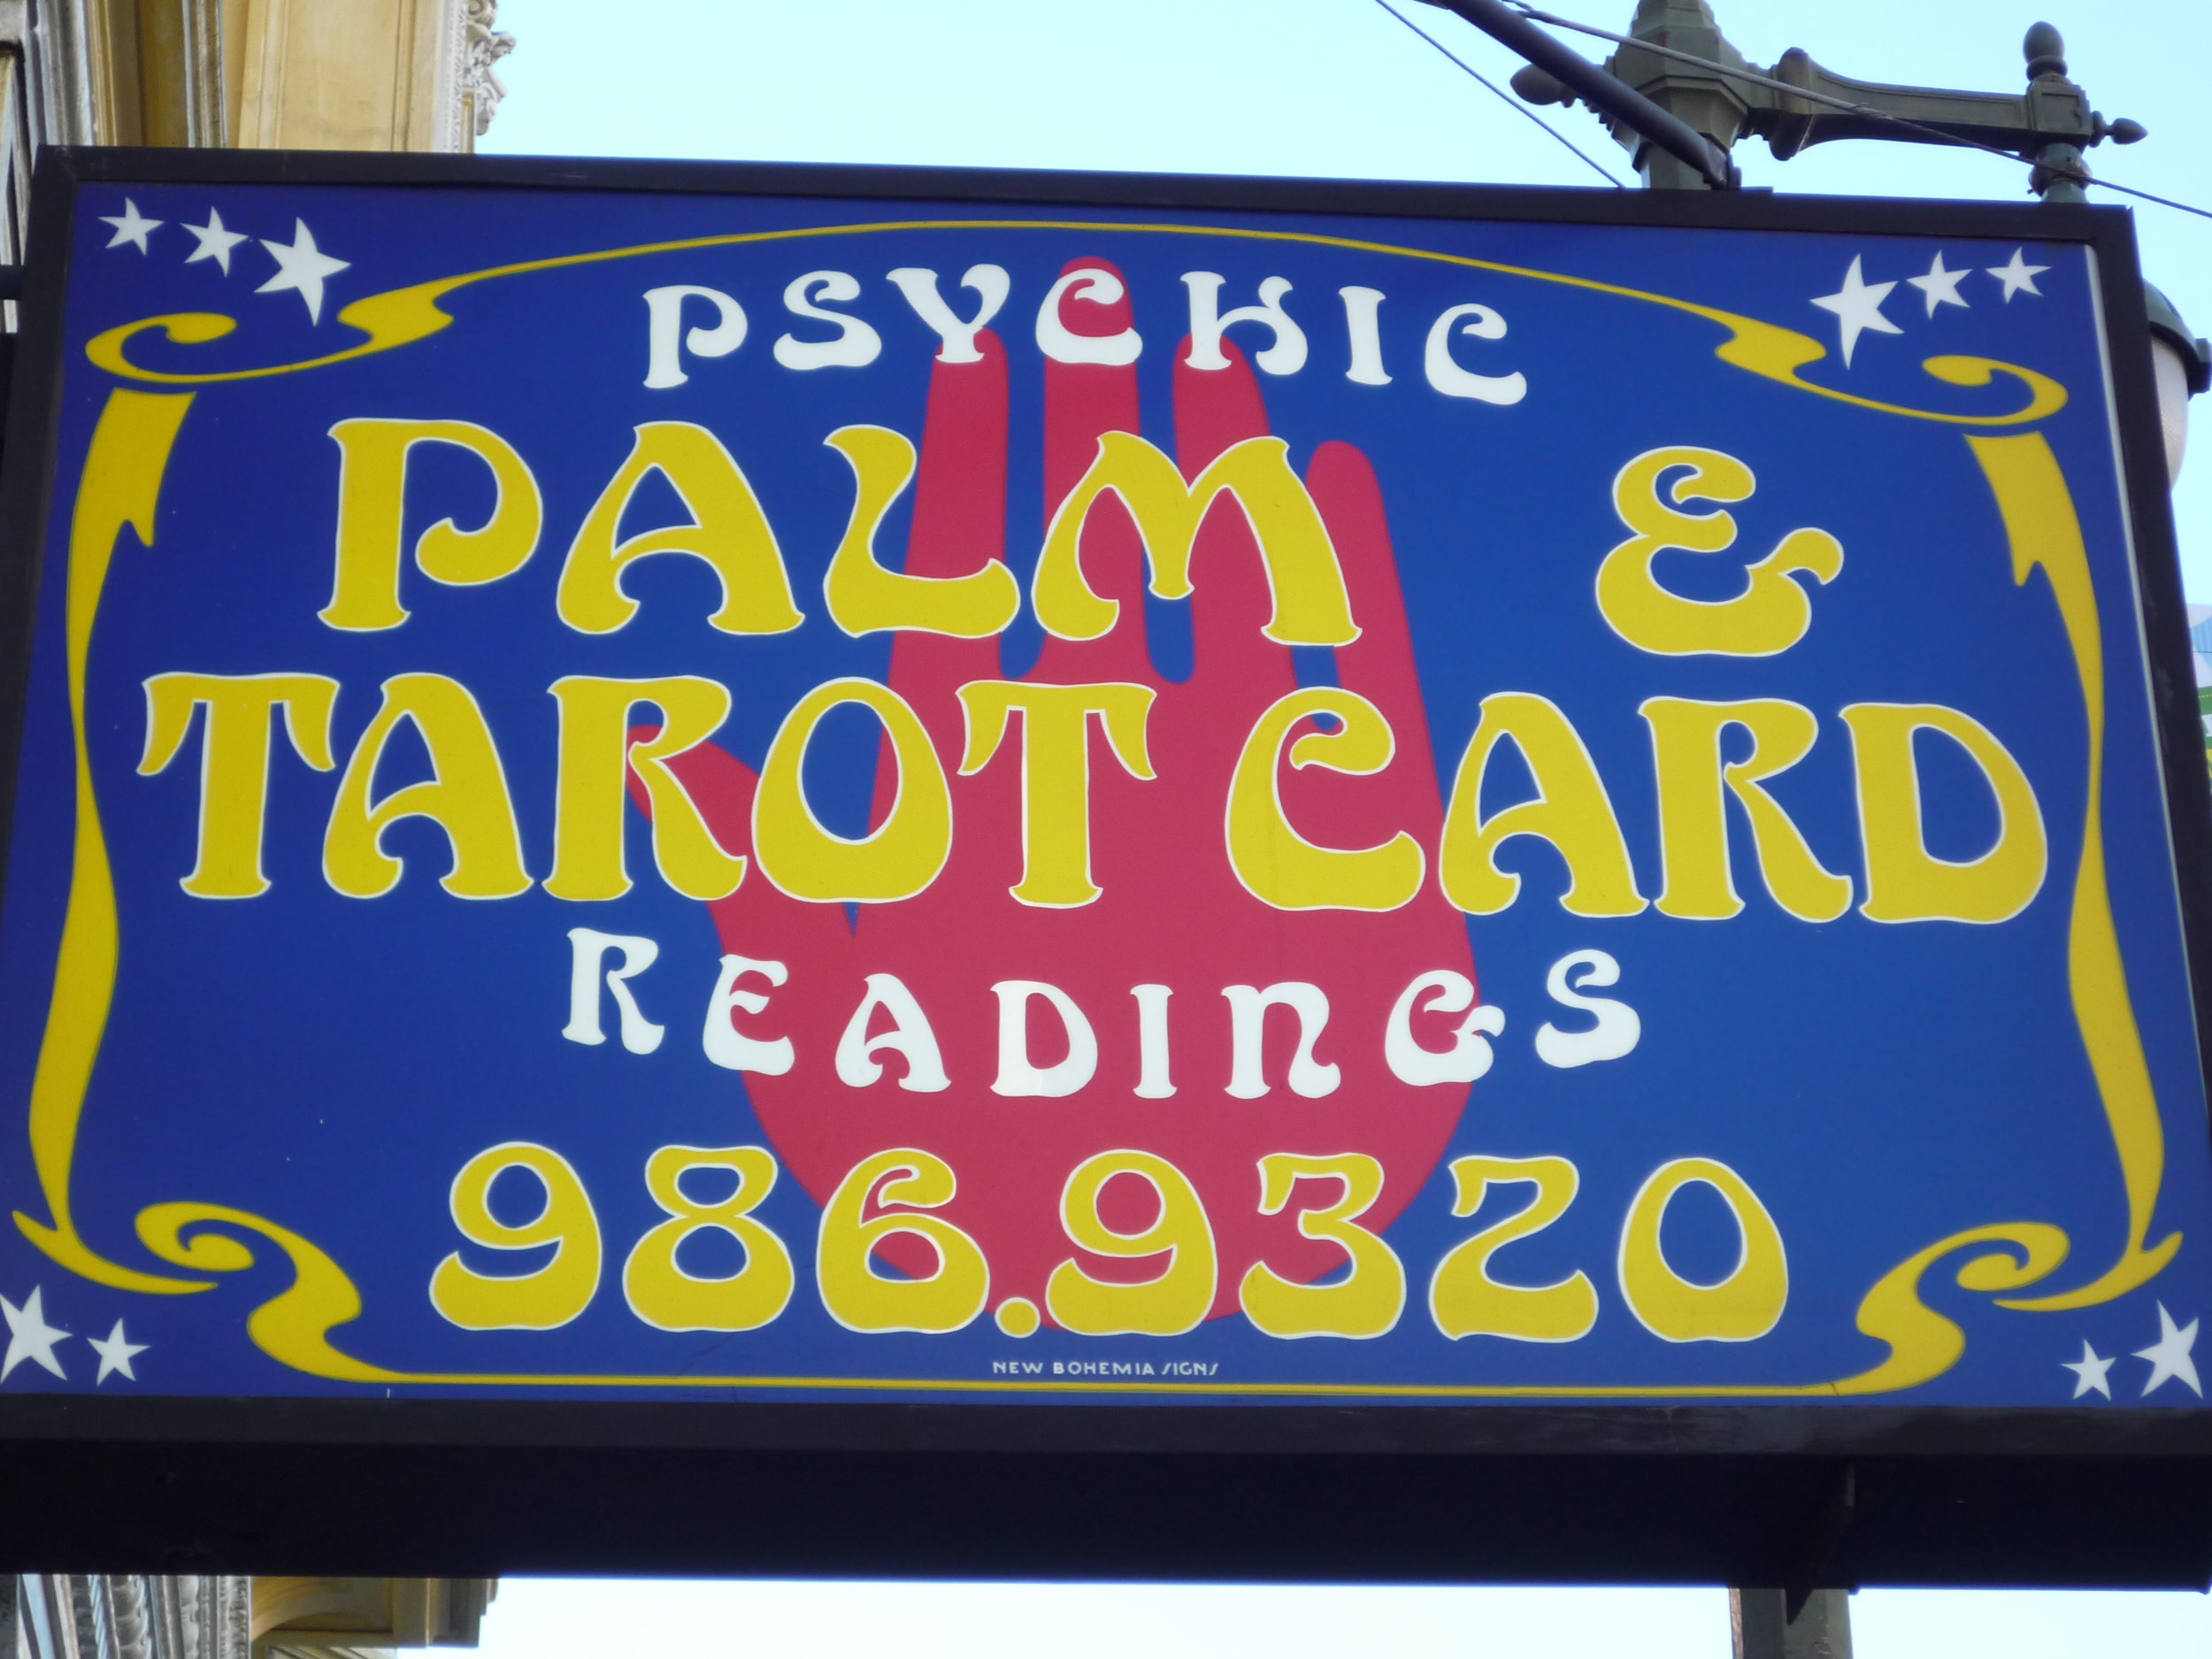 ORIG-psychic-palm--tarot-card-readings-north-beach_3131006997_o.jpg